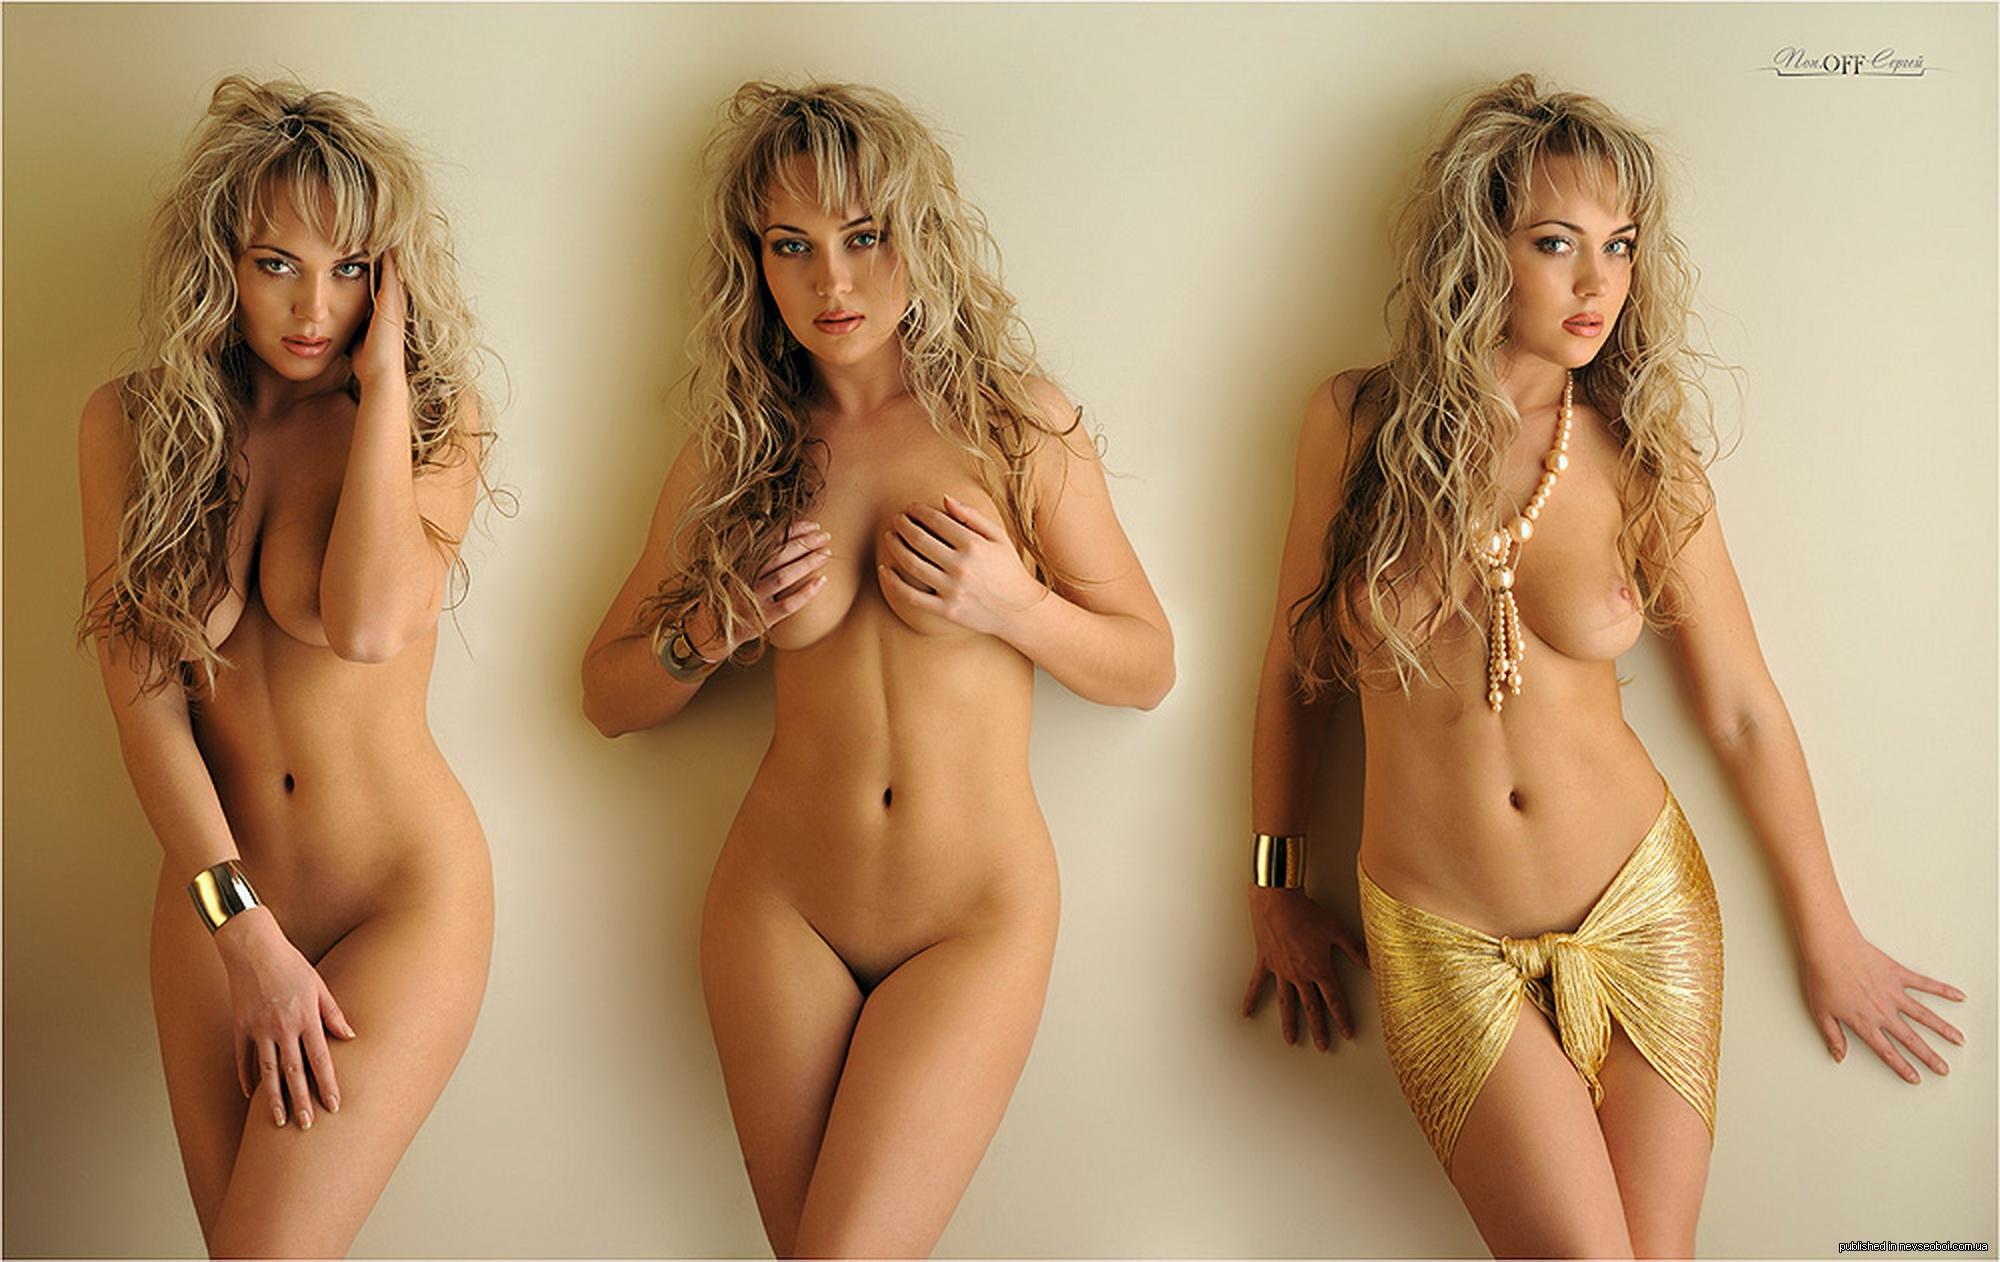 Sexy women naked photo style hentai movies